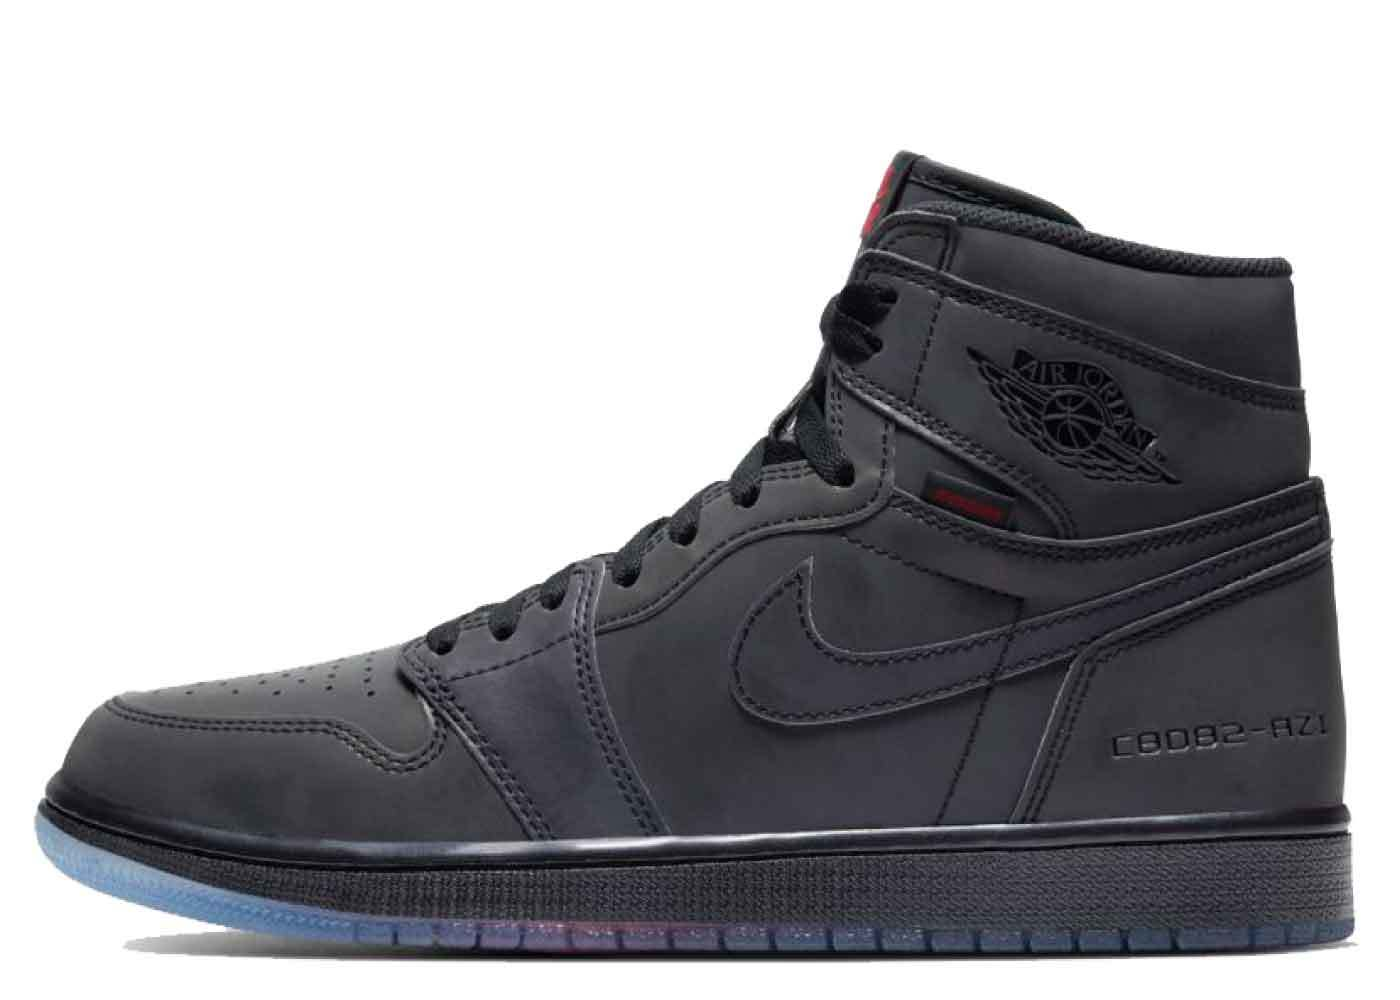 Nike Air Jordan 1 Retro High Fearless Zoomの写真